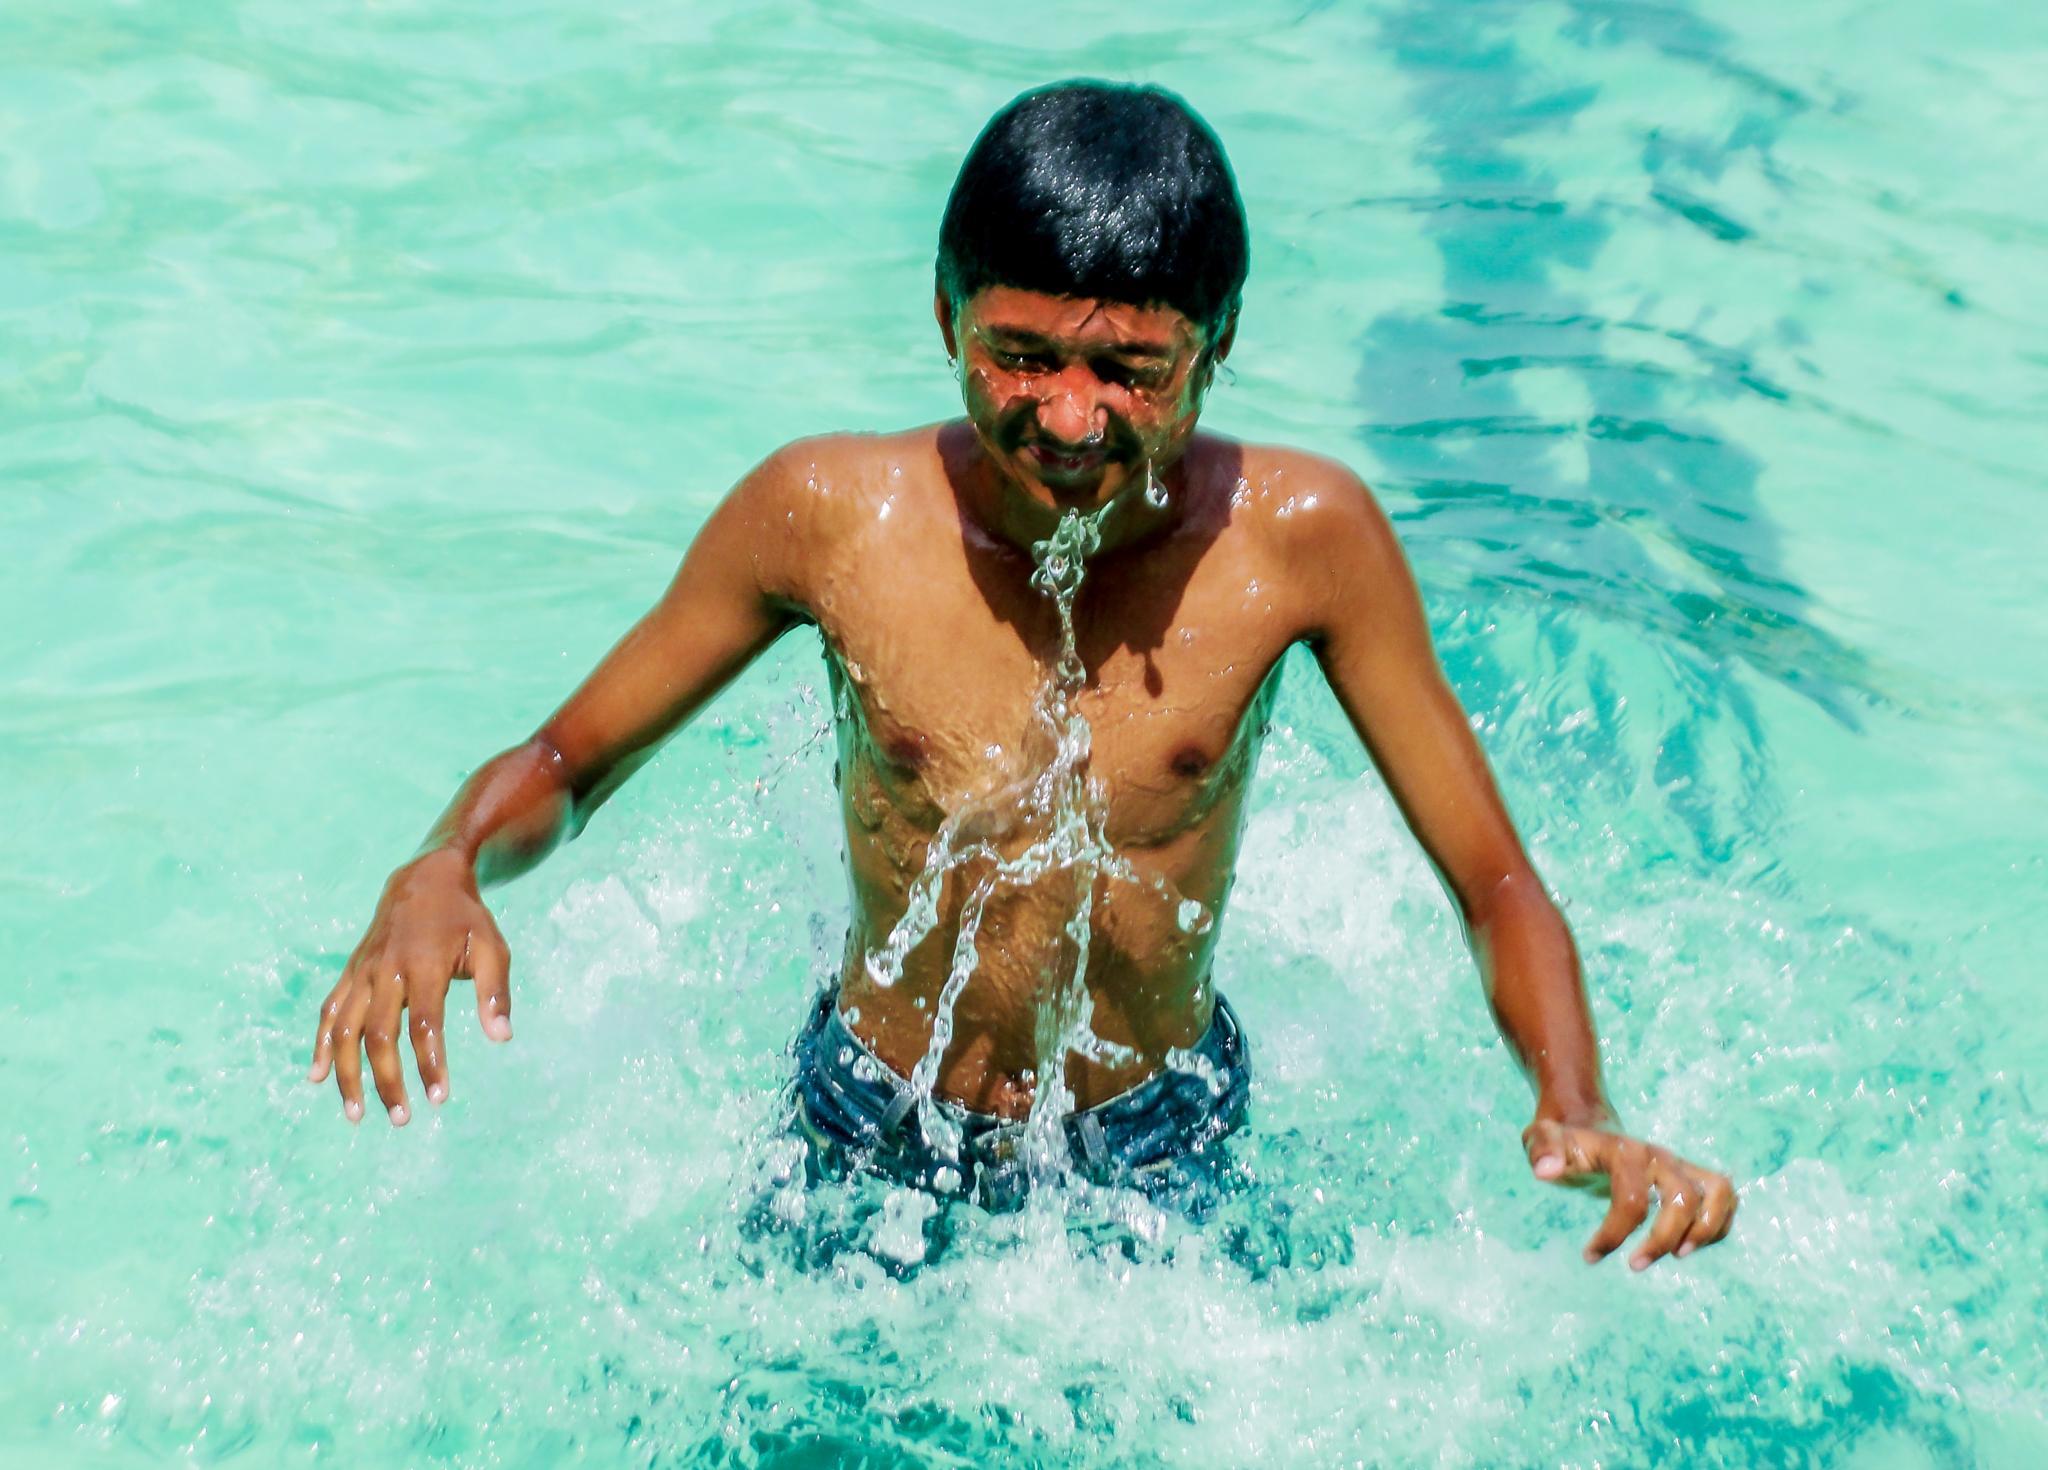 Splash! by Mahamudul Hasan